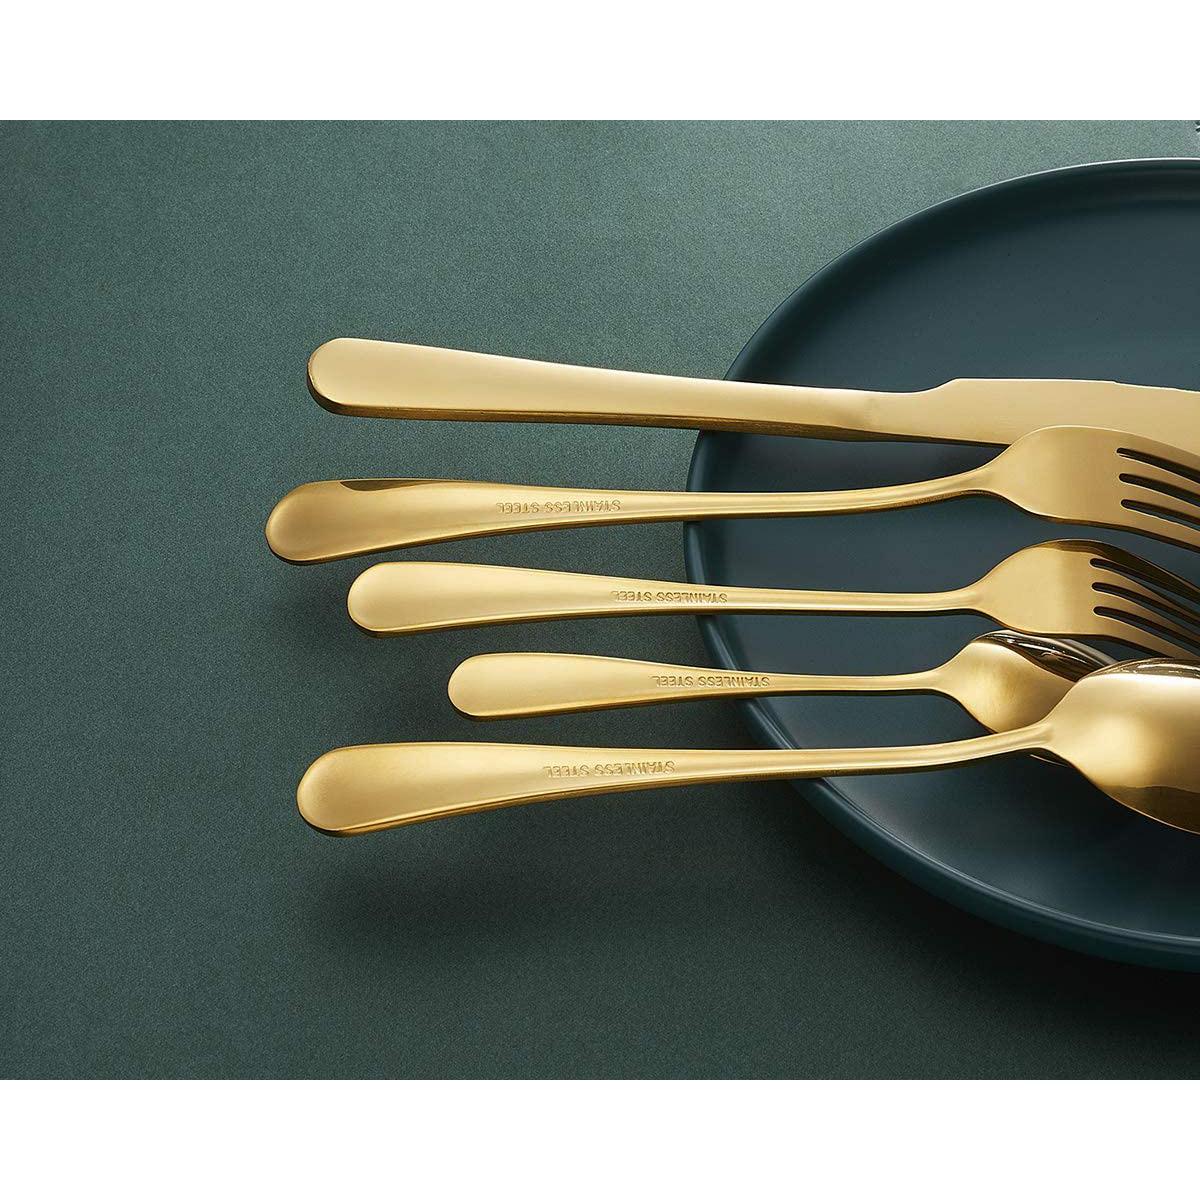 Wholesale Amazon Hot Gold Flatware Restaurant Shiny Stainless Steel Cutlery Set